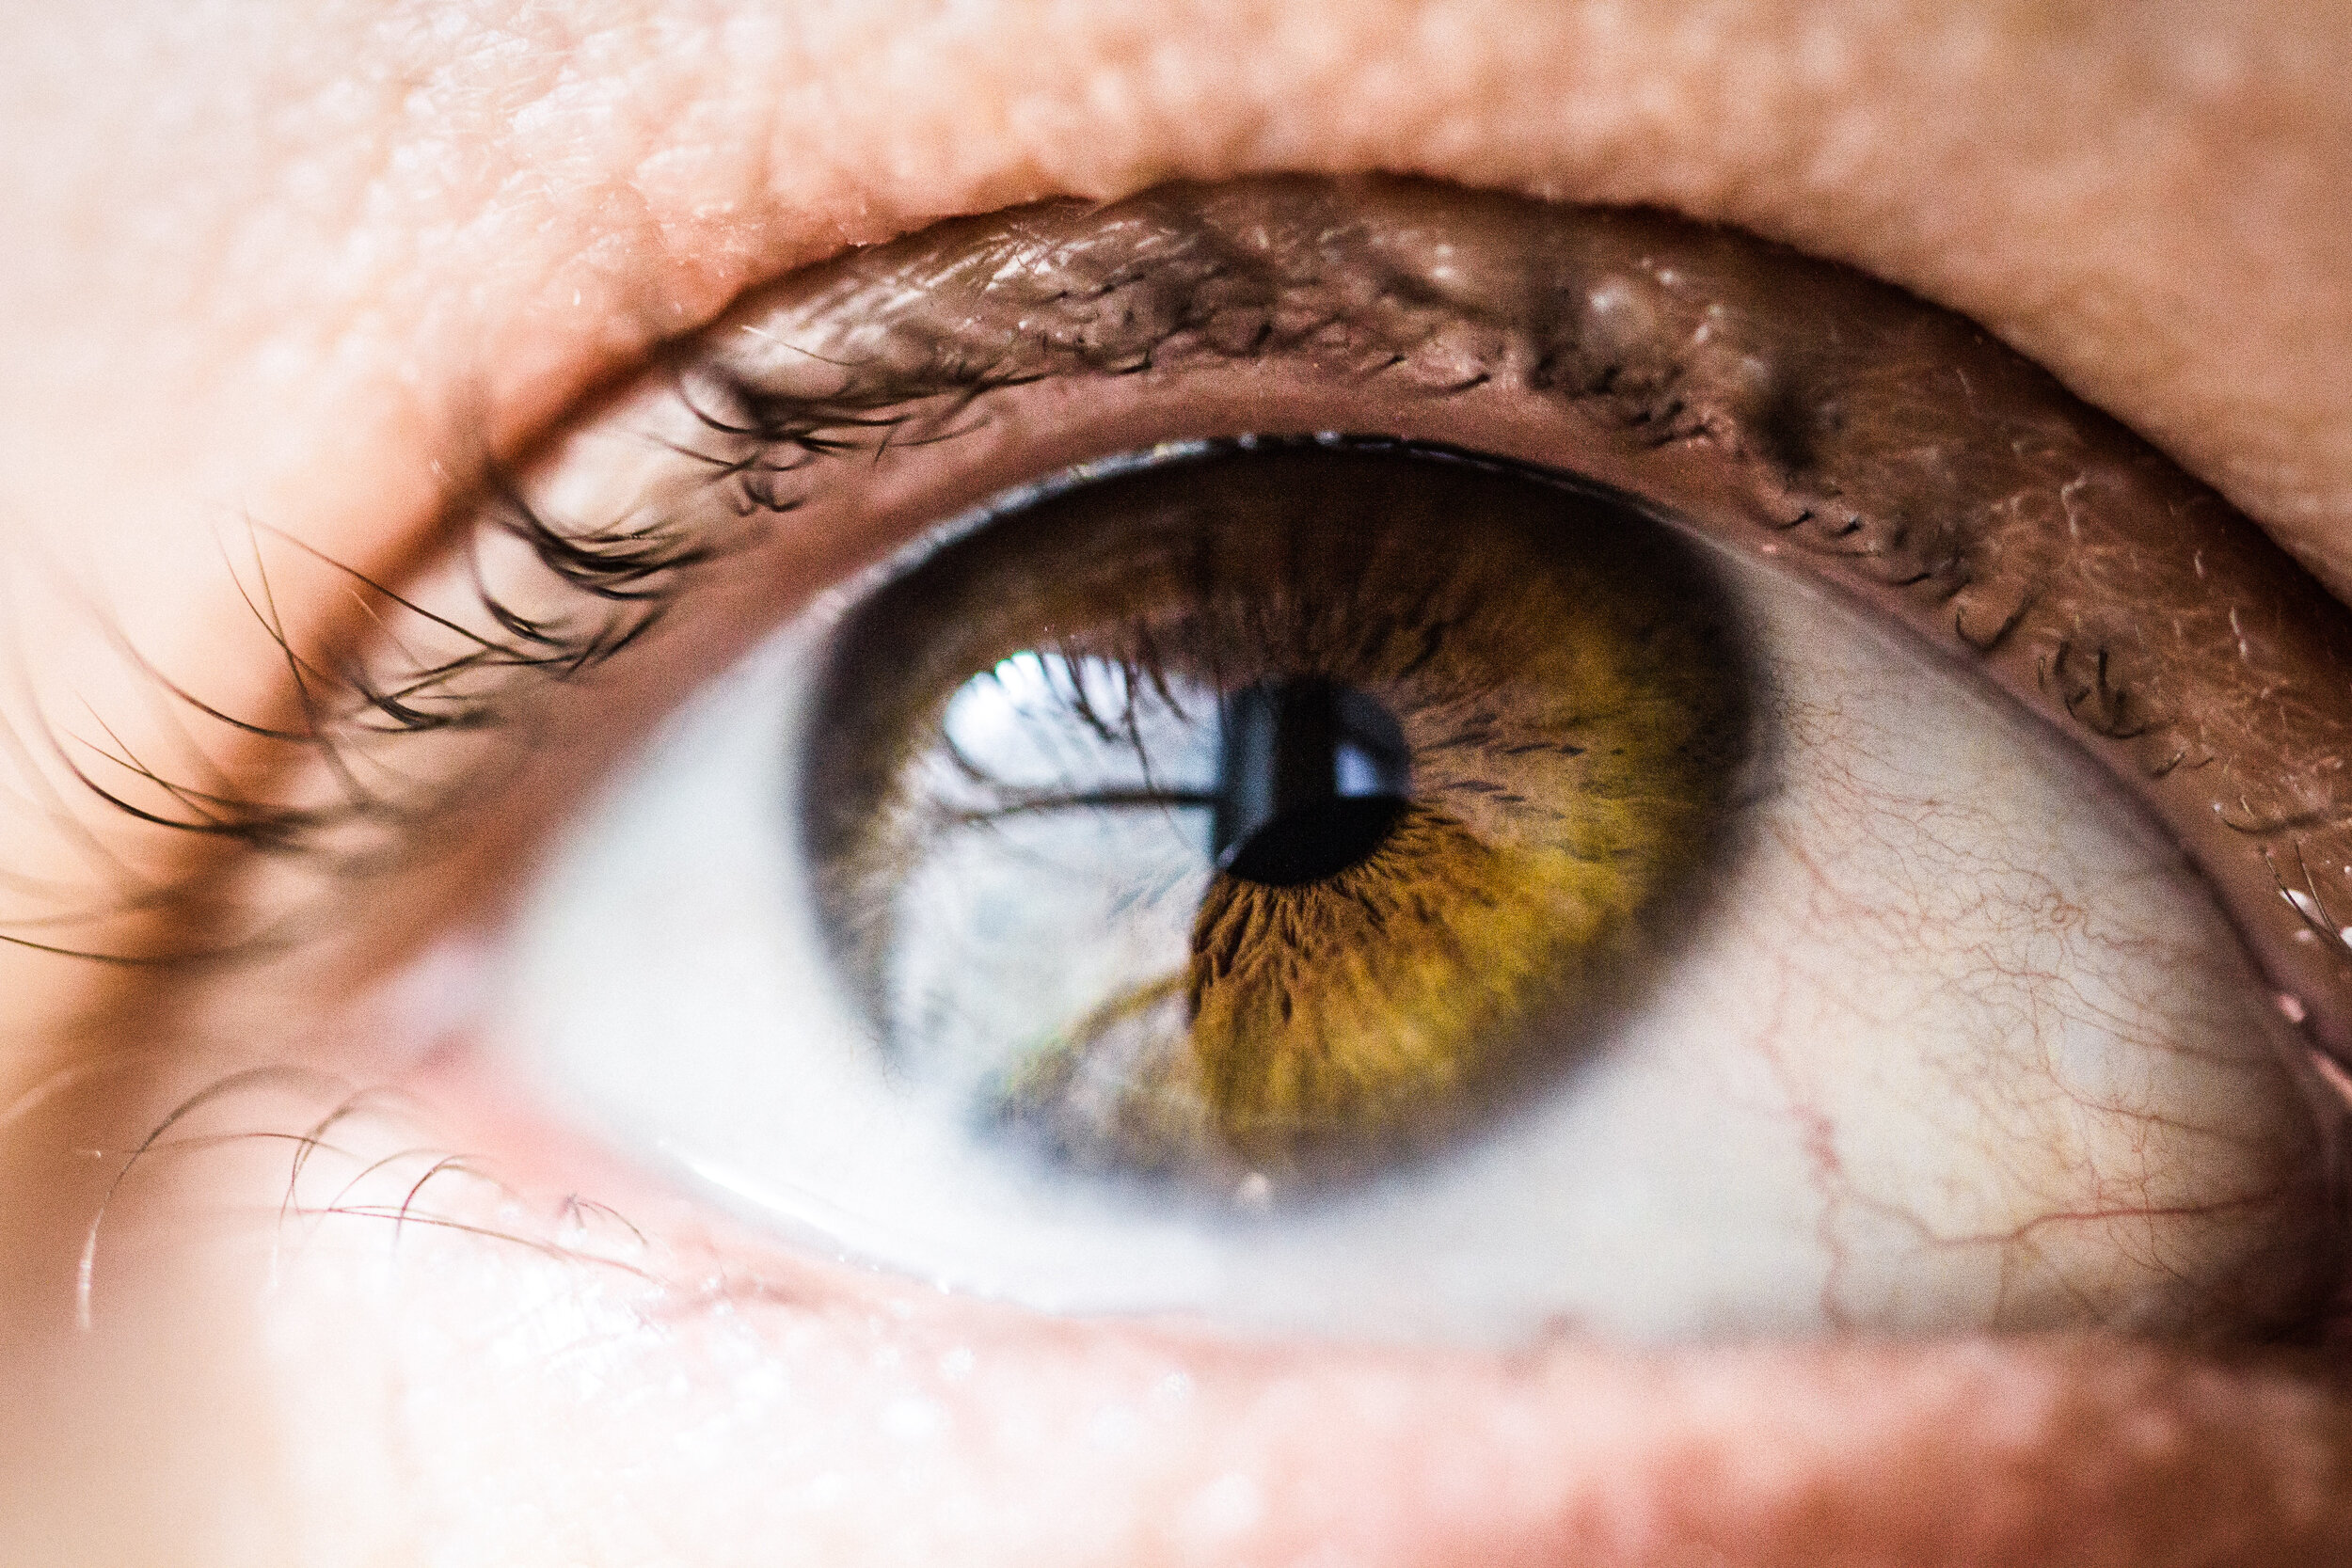 Ocular Lead Toxicity - Target Organ Toxicity